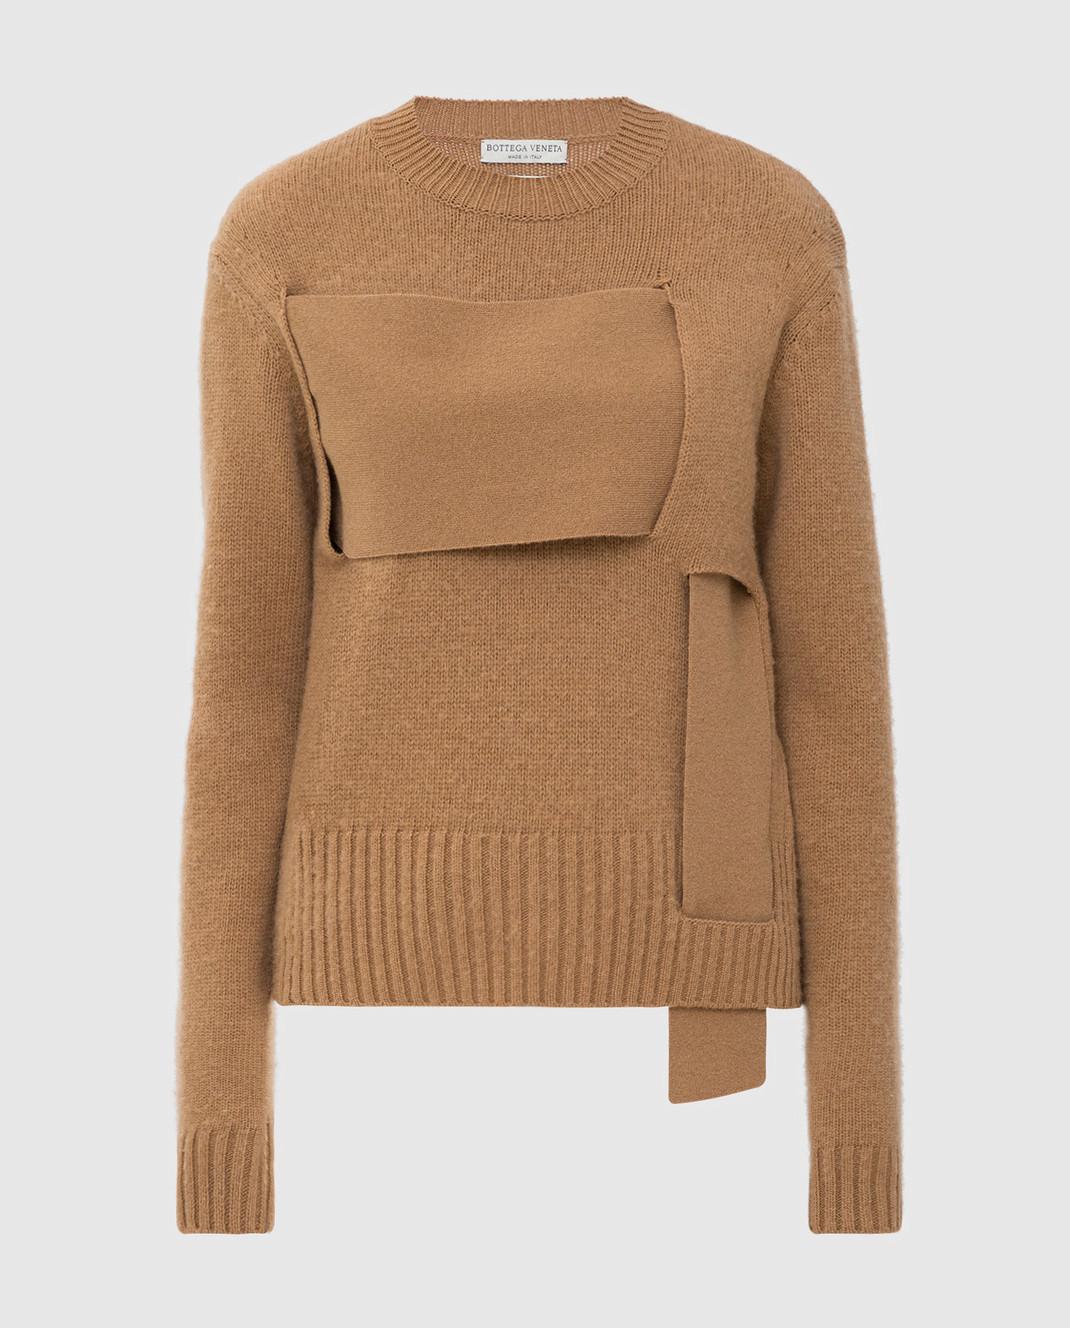 Bottega Veneta Бежевый свитер из шерсти 577543